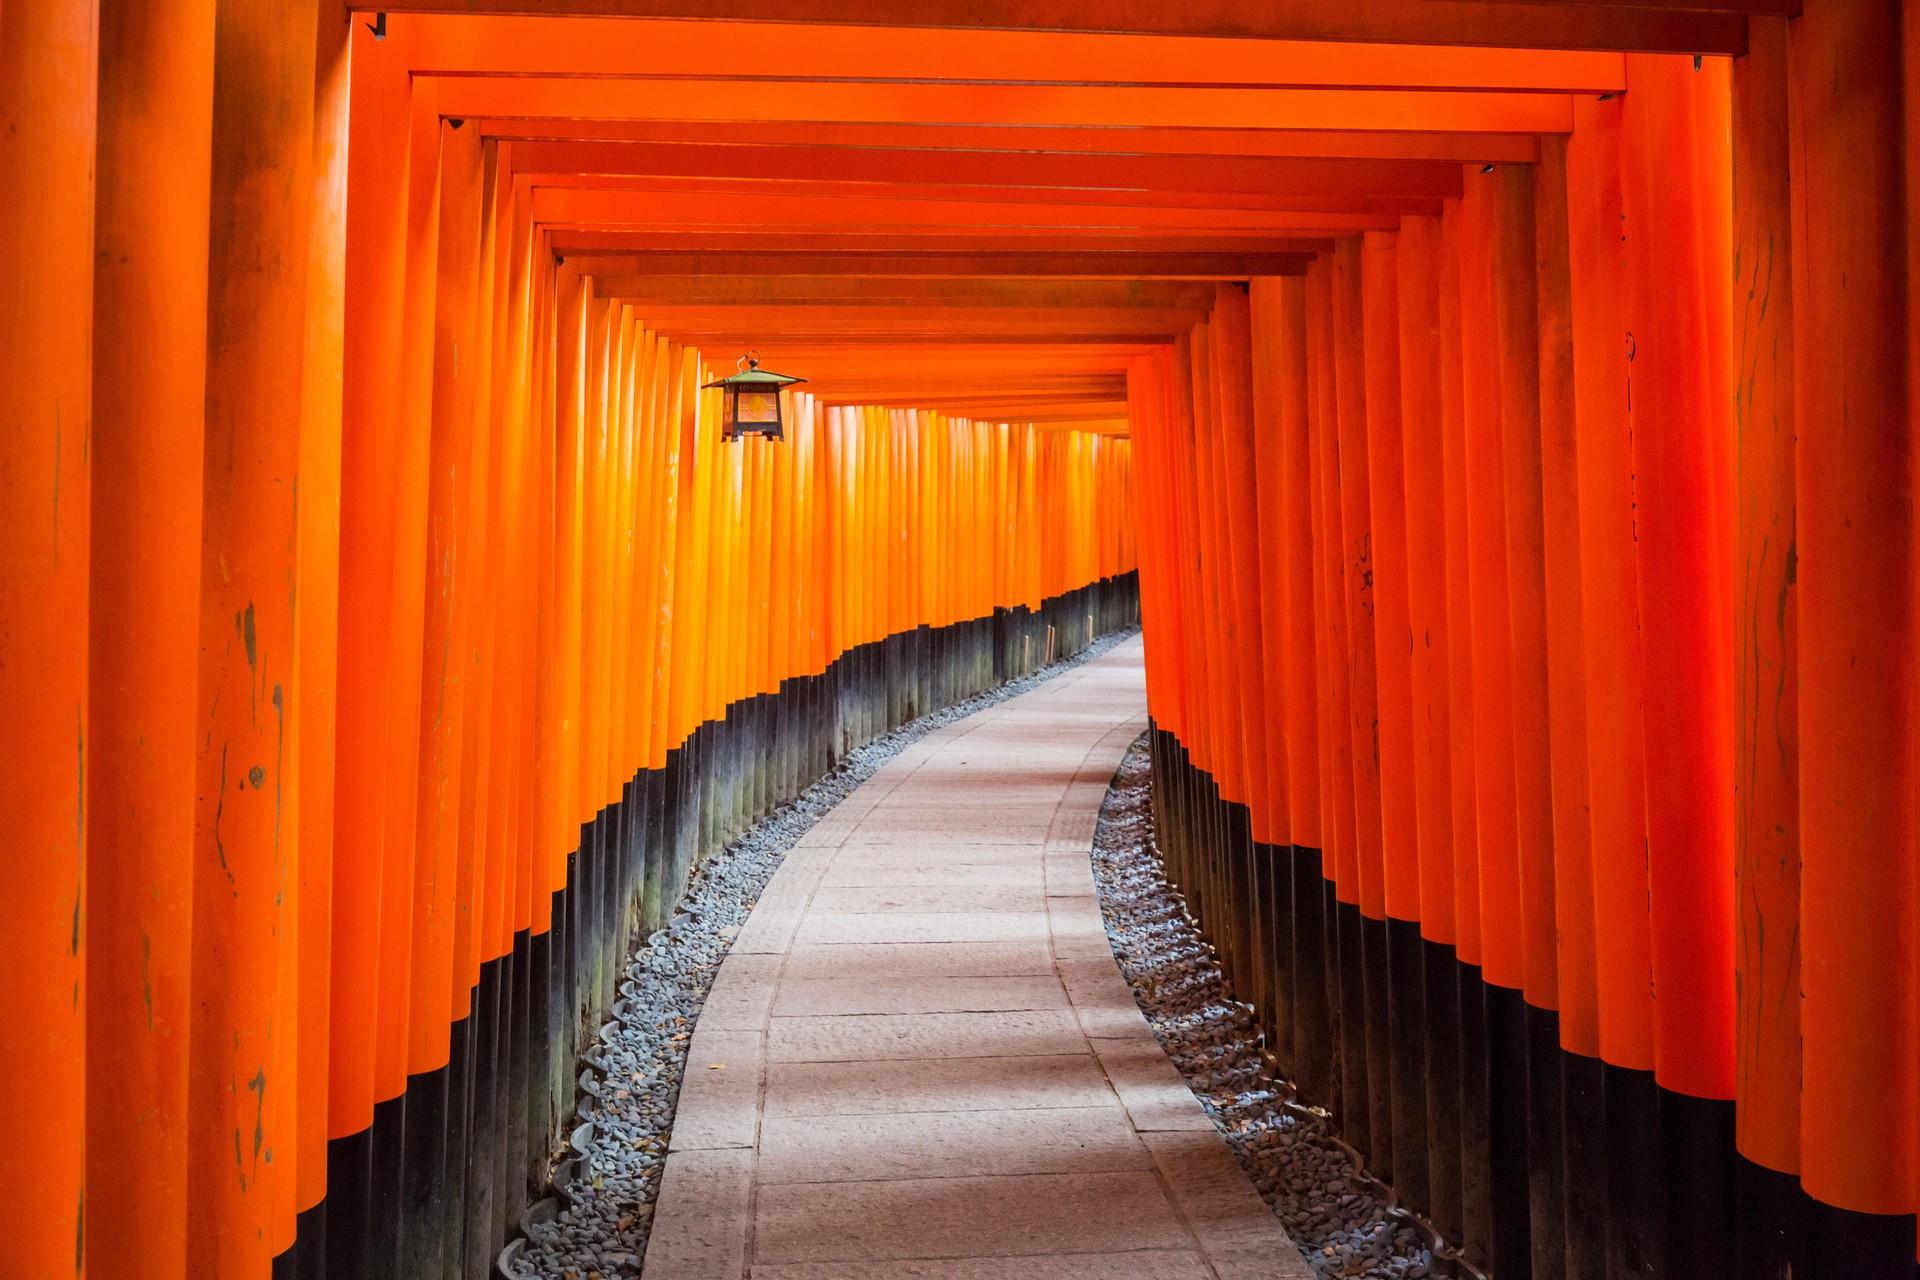 The orange torii gates of the Fushimi-Inari Shrine in Kyoto